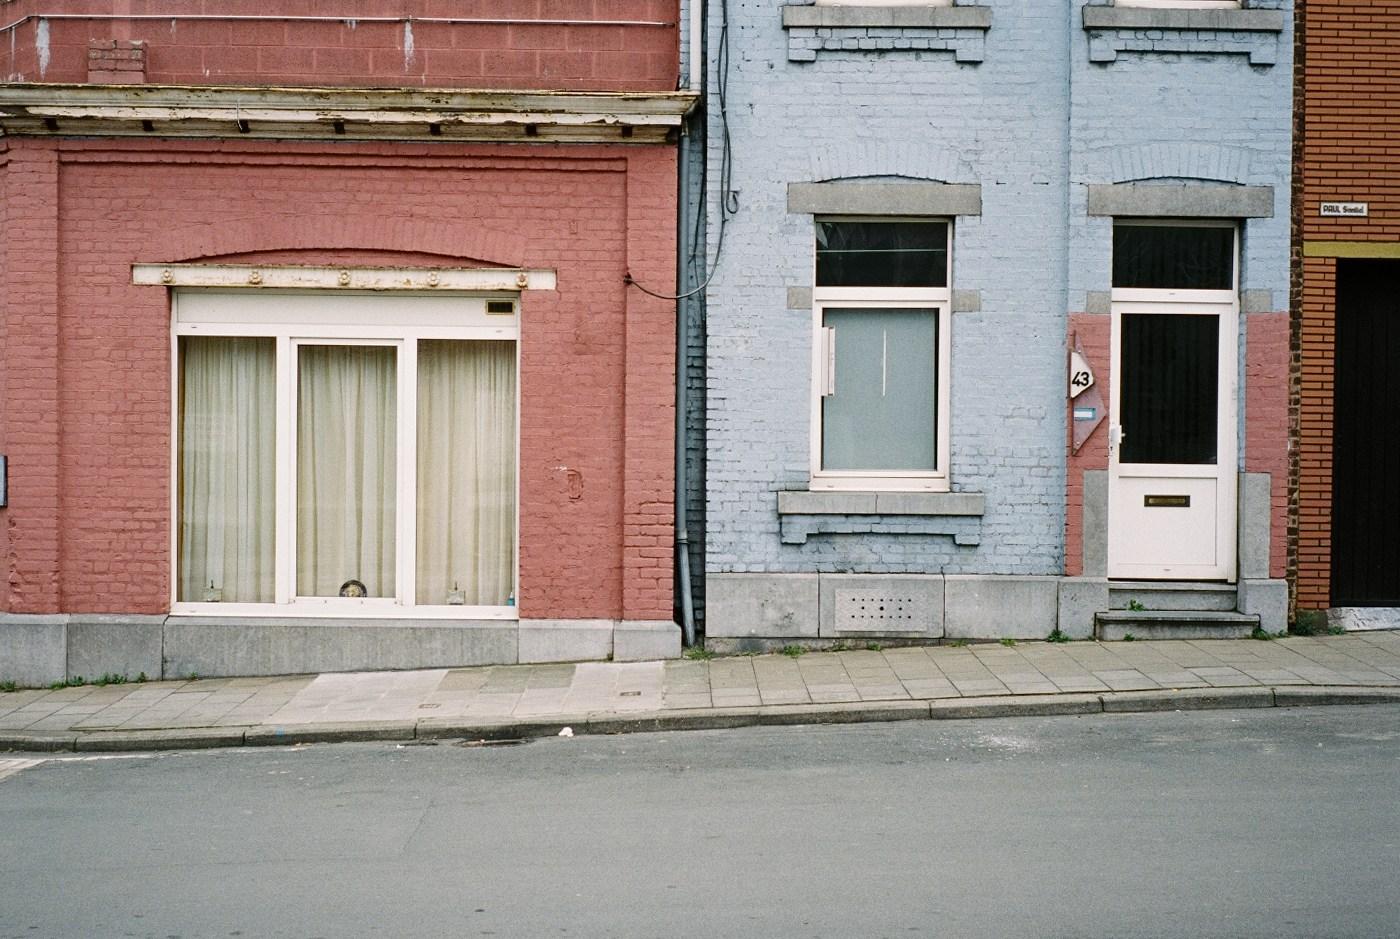 000032JoergBergs-KodakPortra400-MeinFilmLab-M7-35